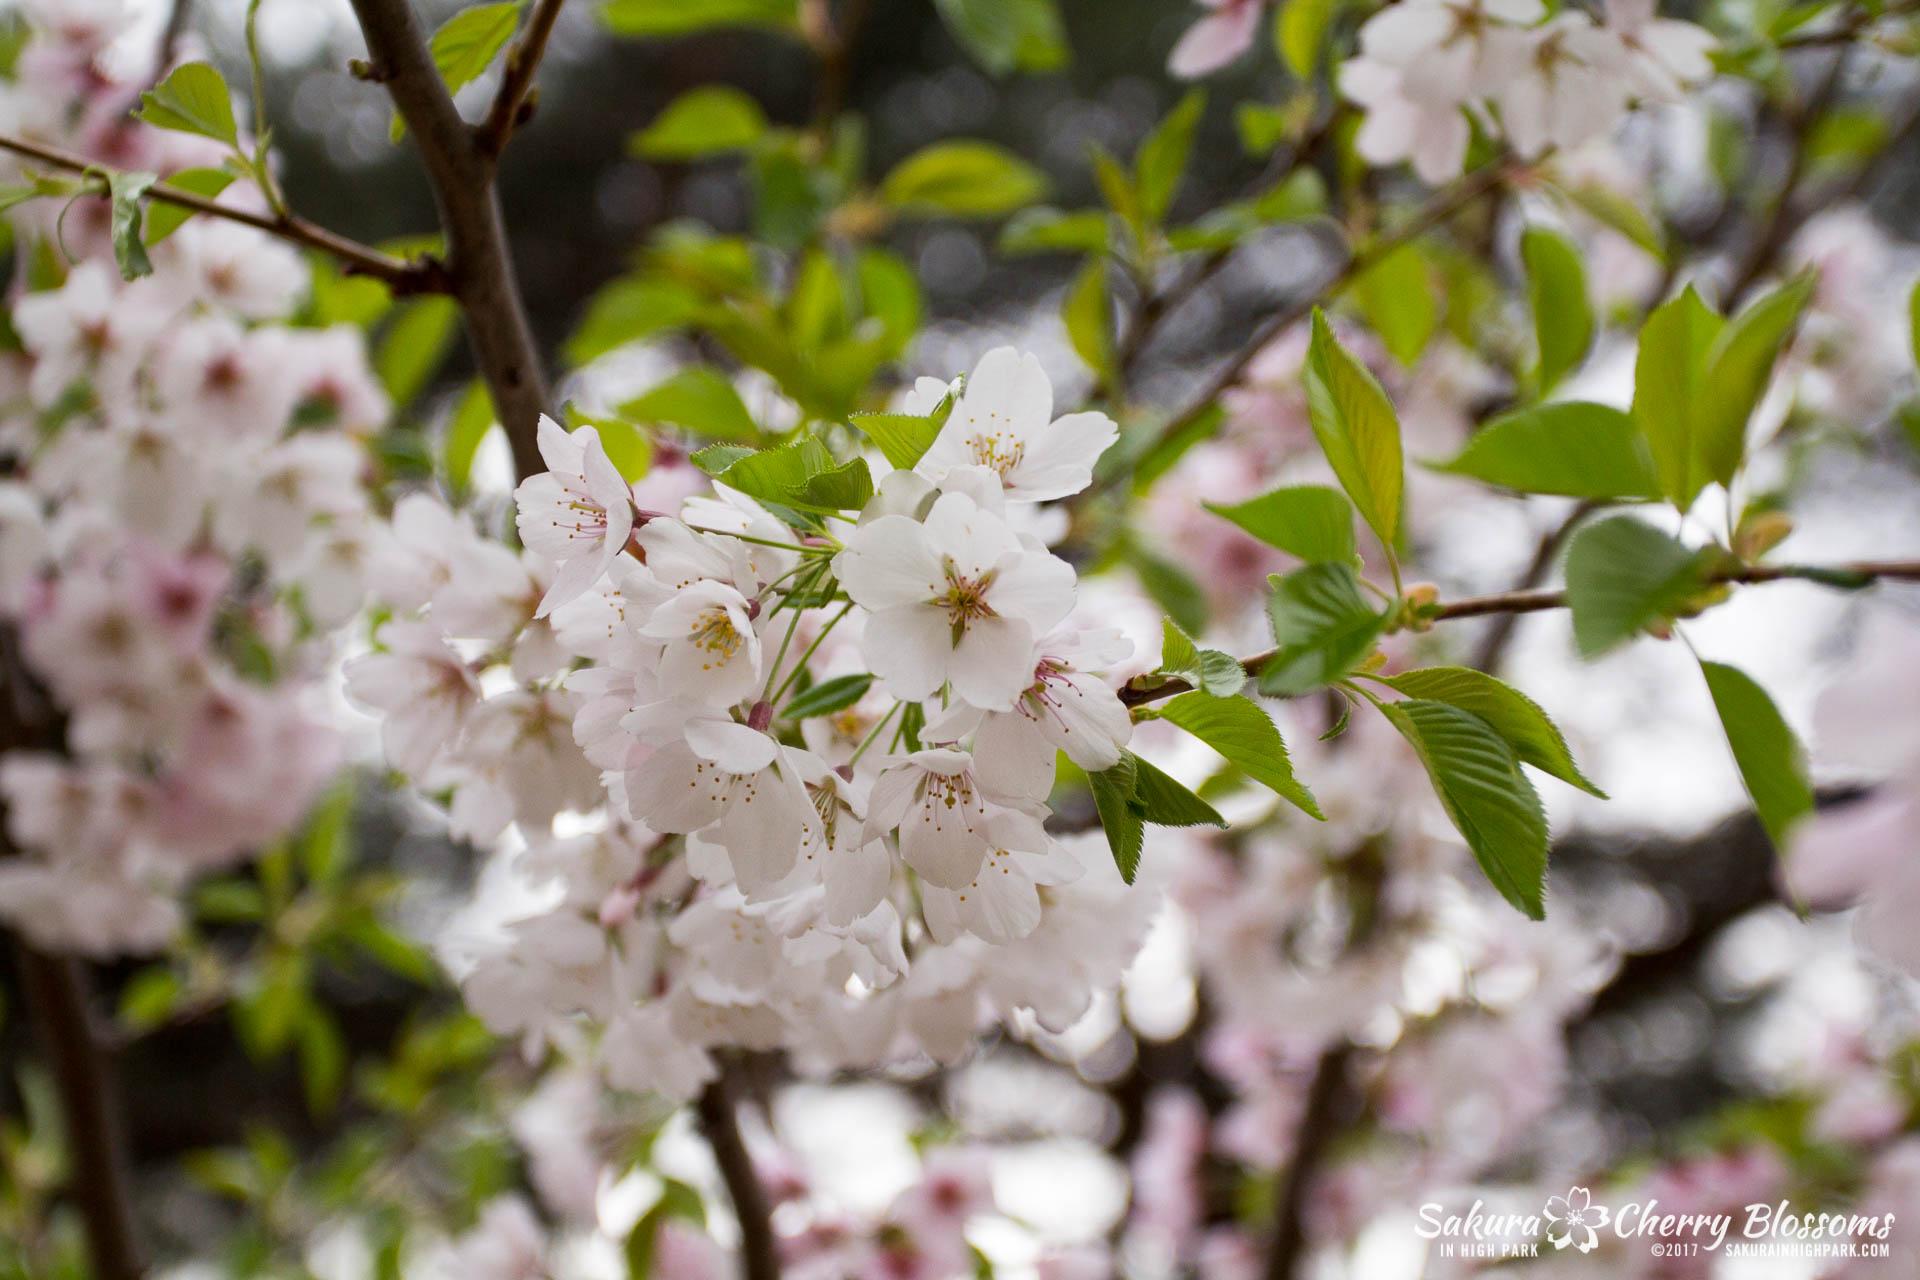 Sakura-Watch-May-2-2017-cherry-blossoms-falling-in-High-Park-133.jpg